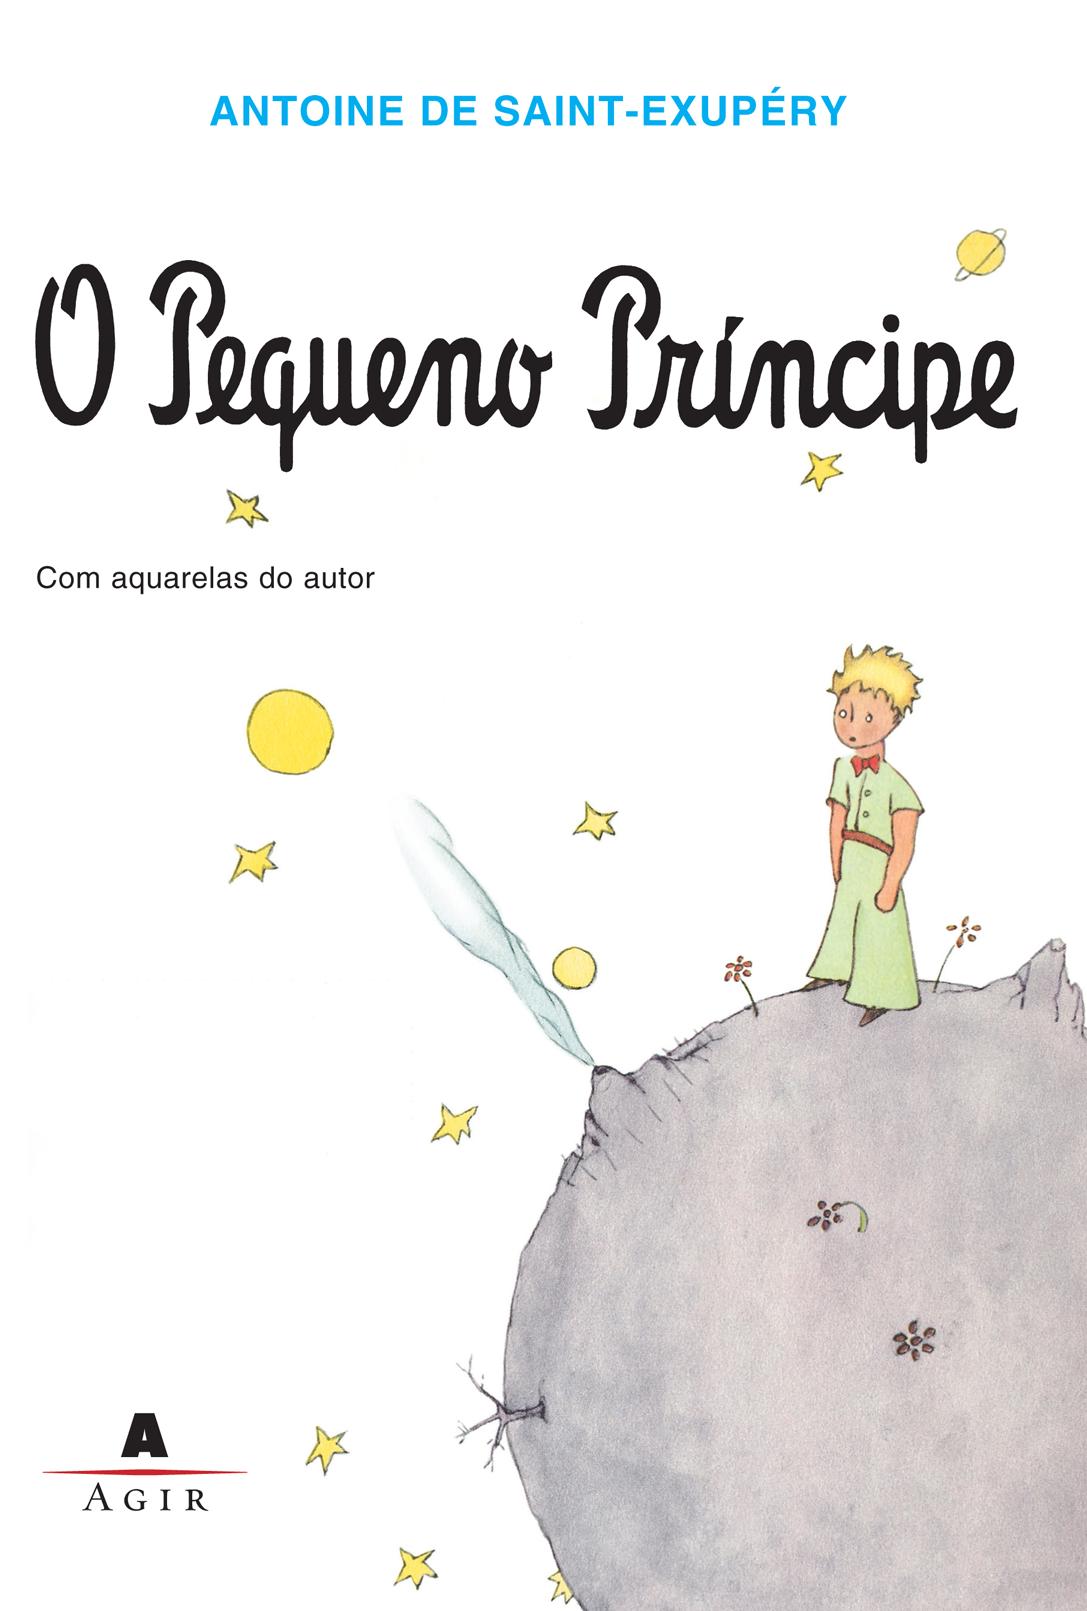 Capa do livro O pequeno Príncípe